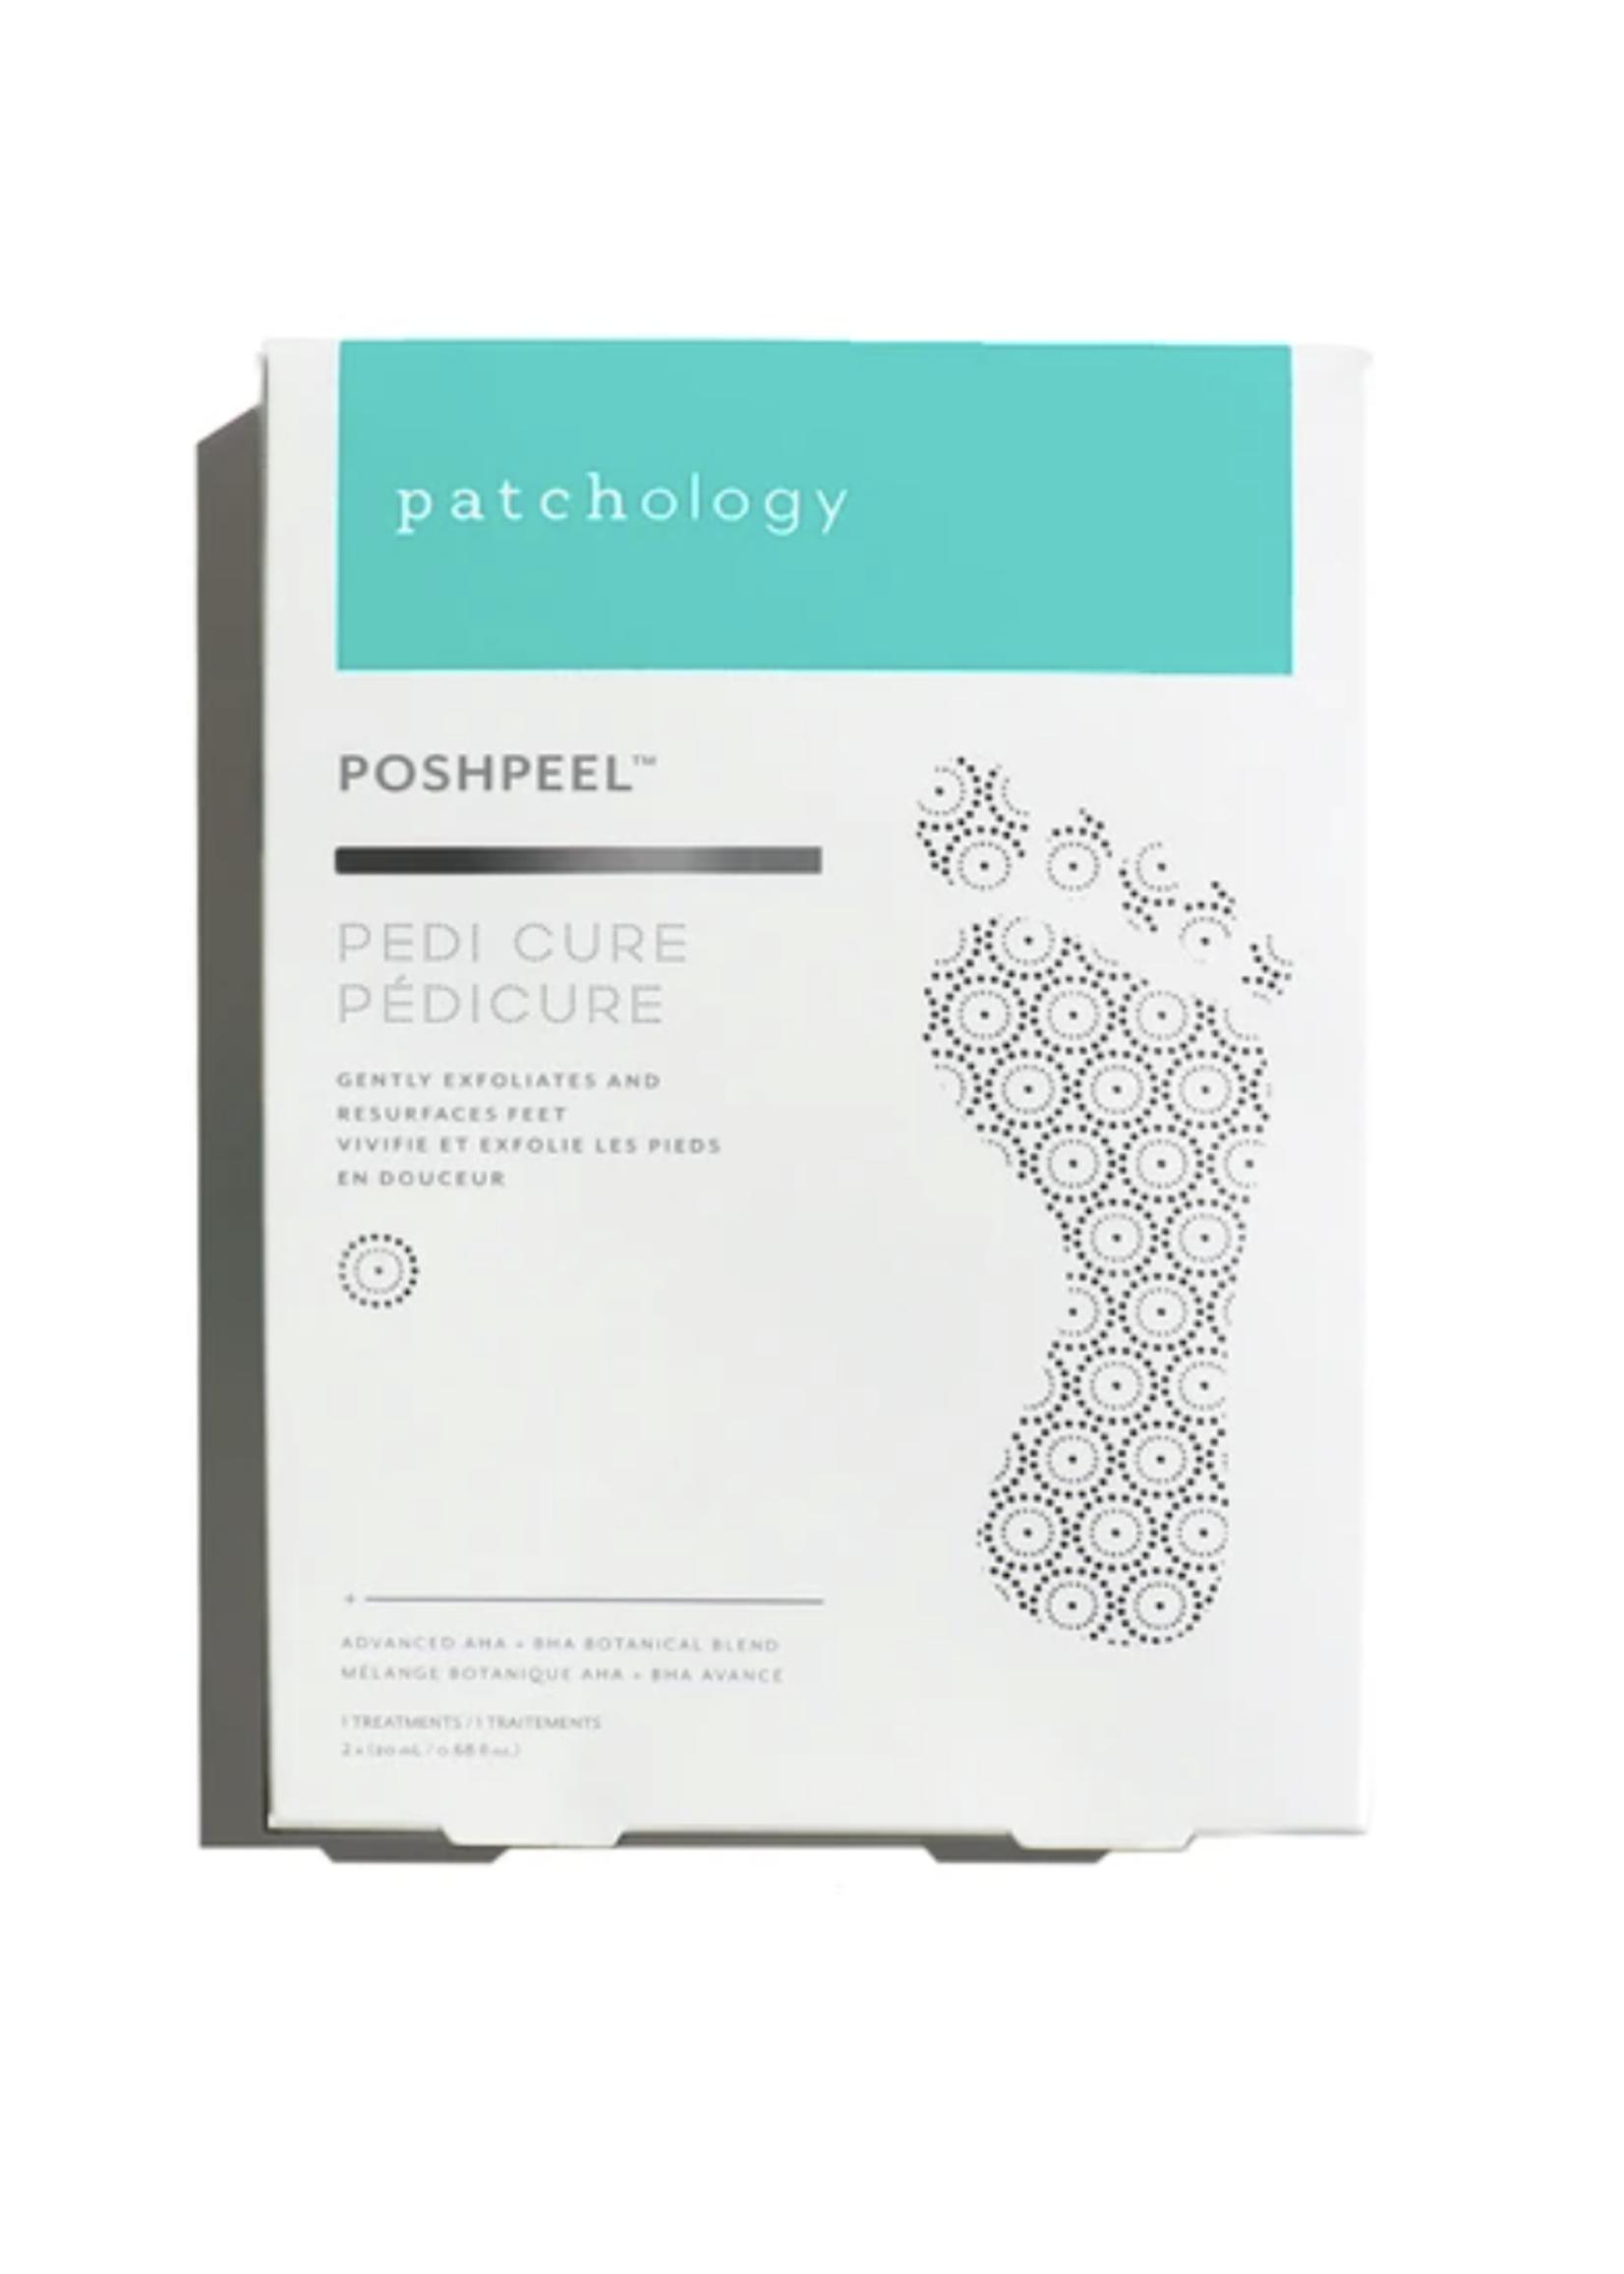 Patchology PoshPeel Pedi Cure by Patchology